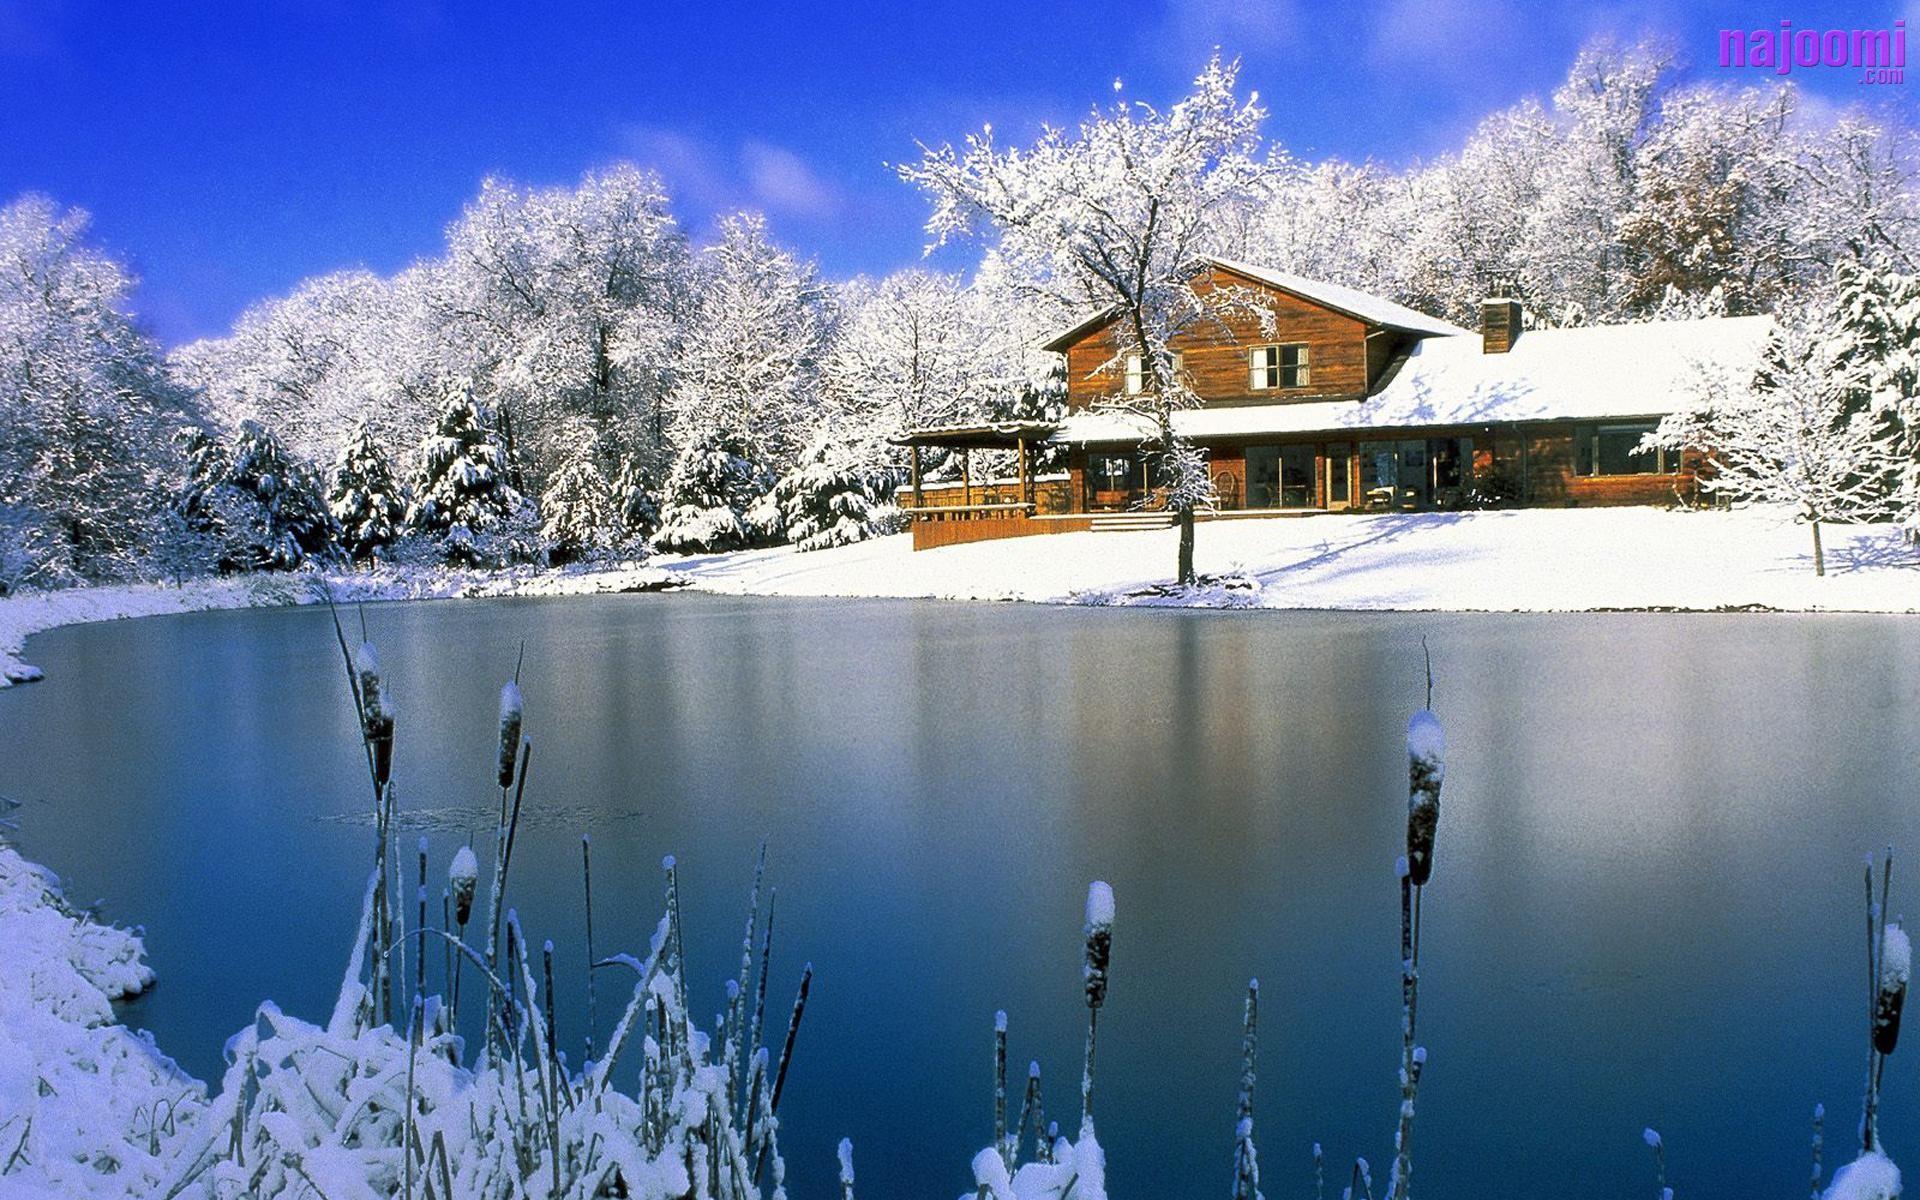 Res: 1920x1200, Pretty Snowy Wallpaper